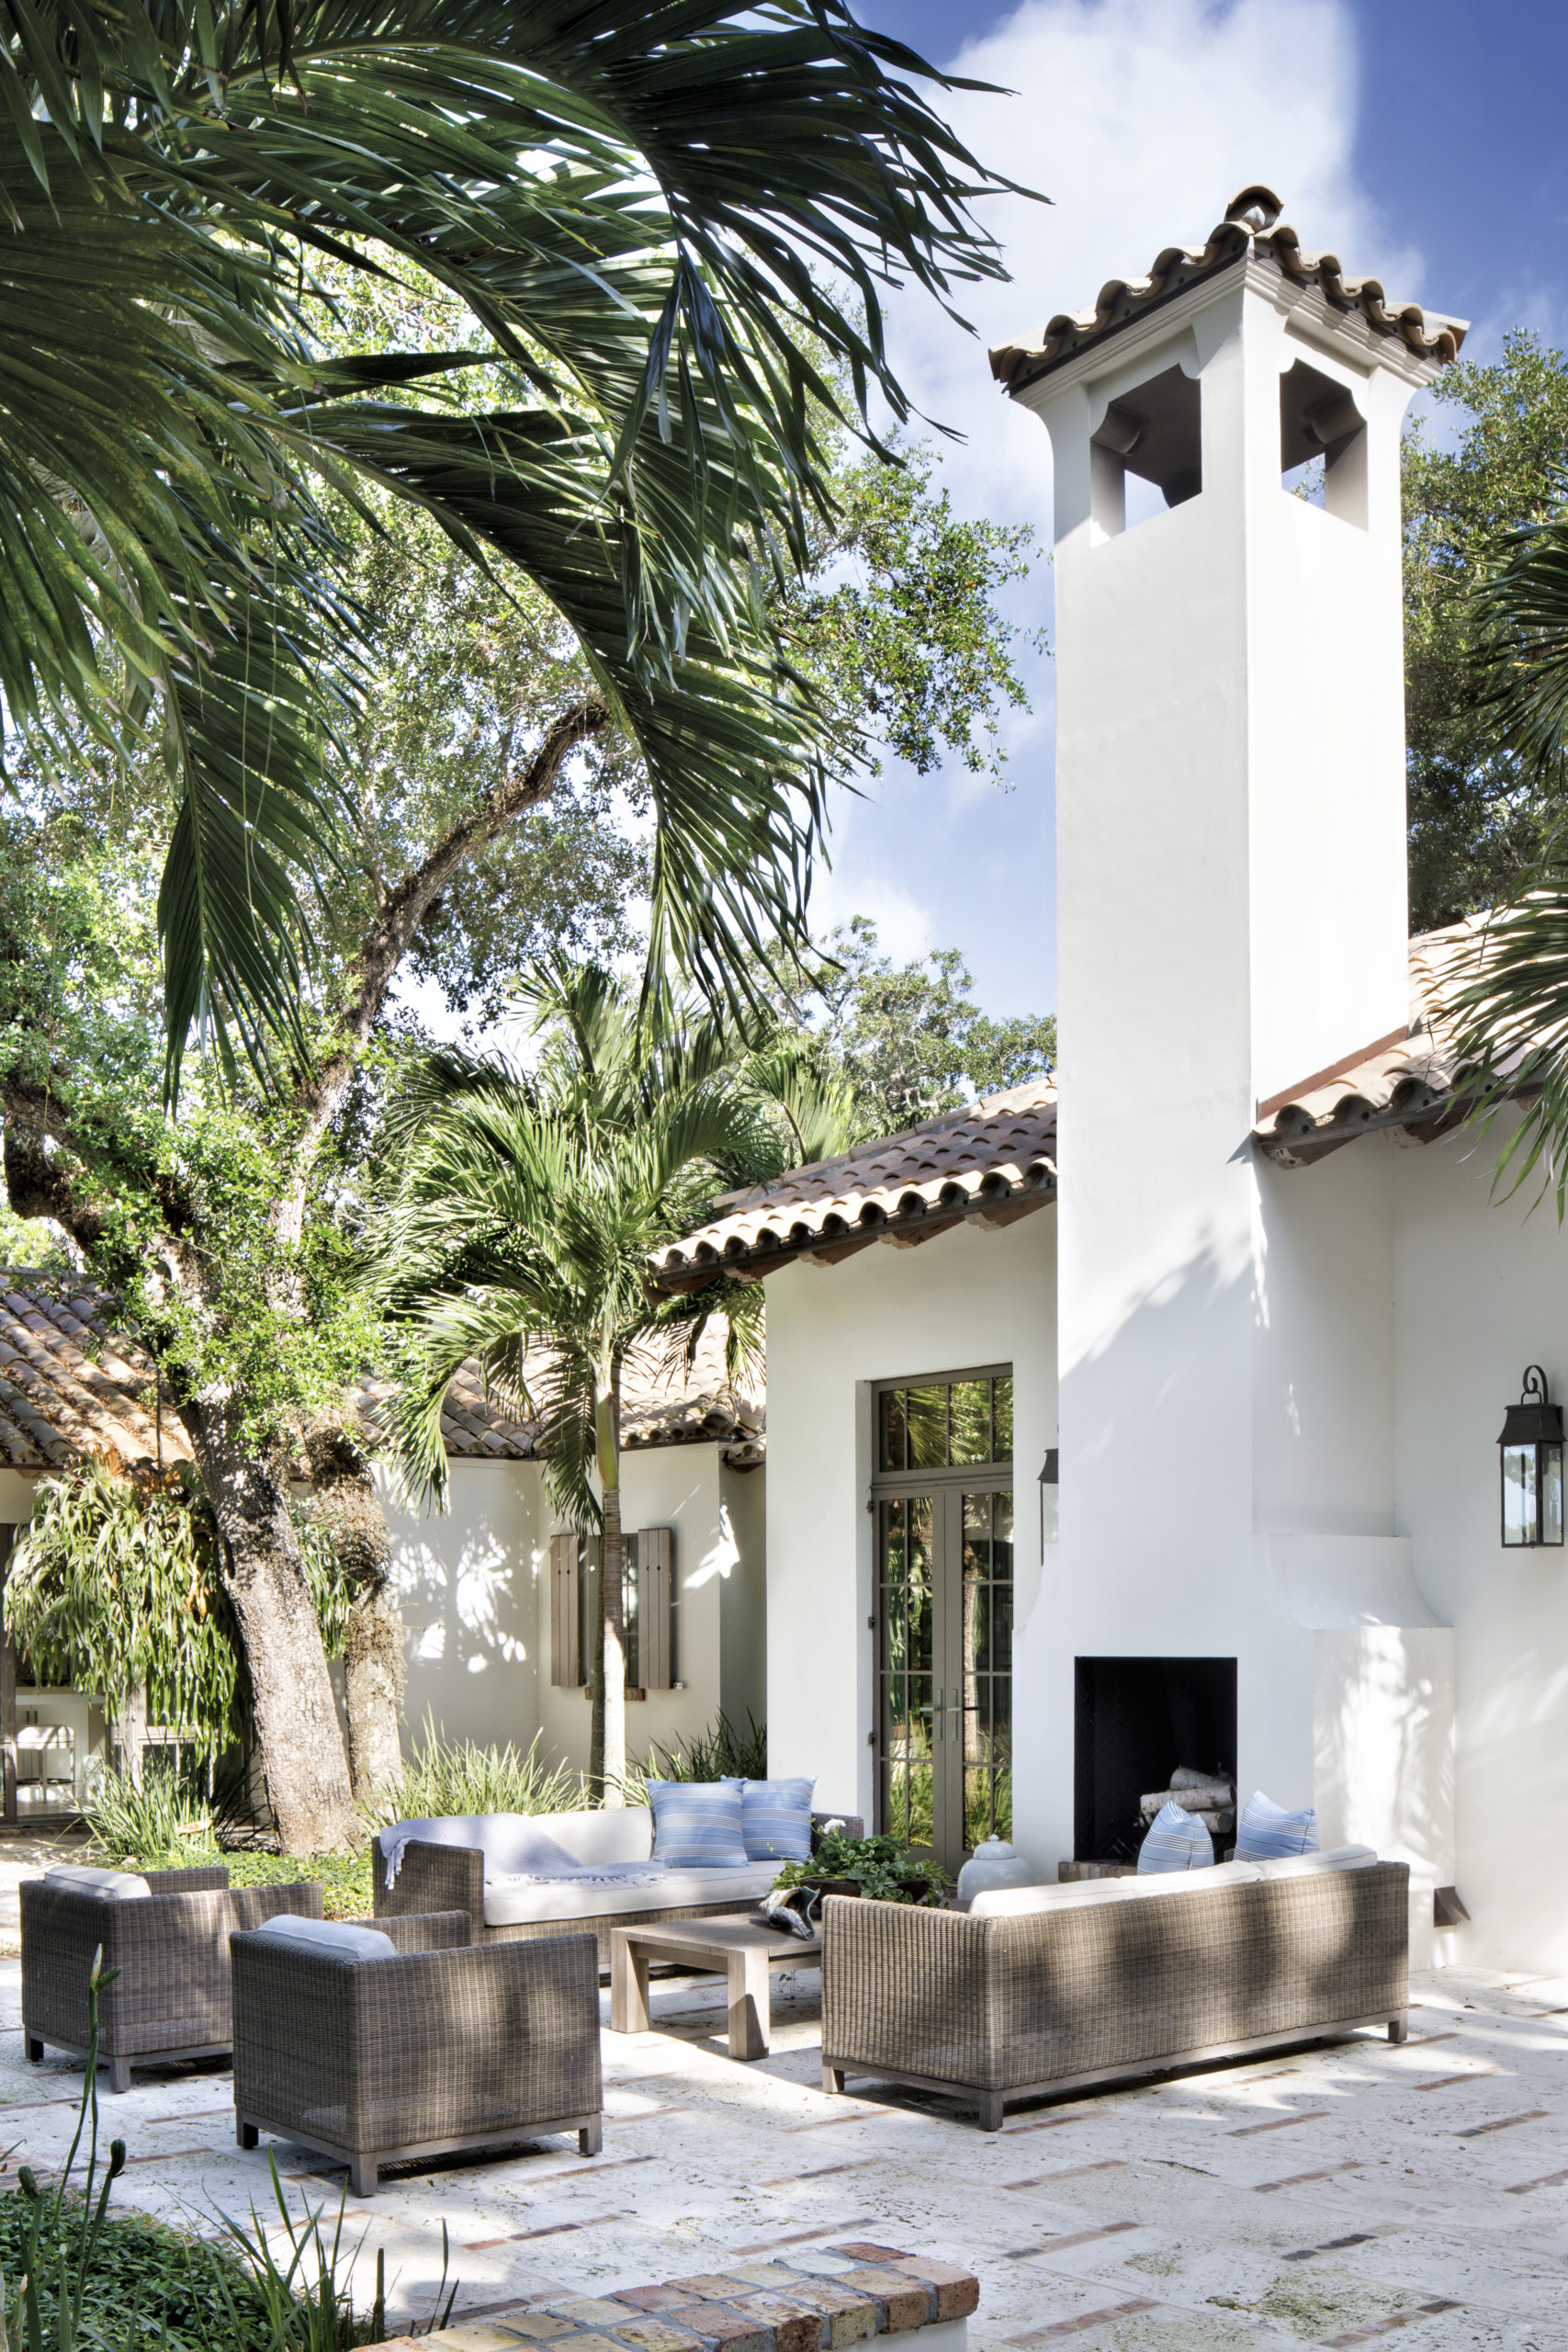 Vero Beach Residence Ludowici Roof Tile